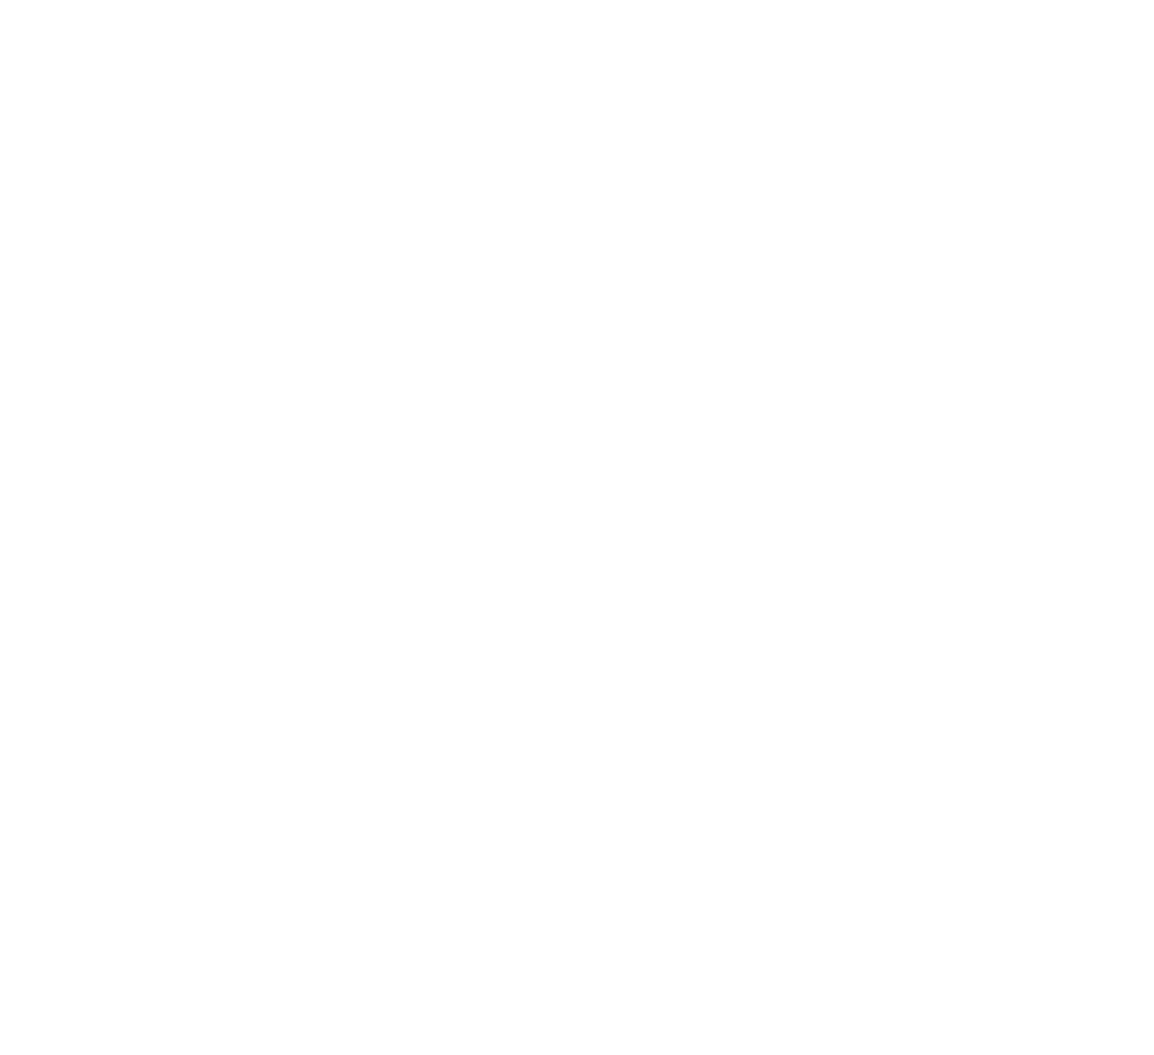 Service Agreement - IDM Inc